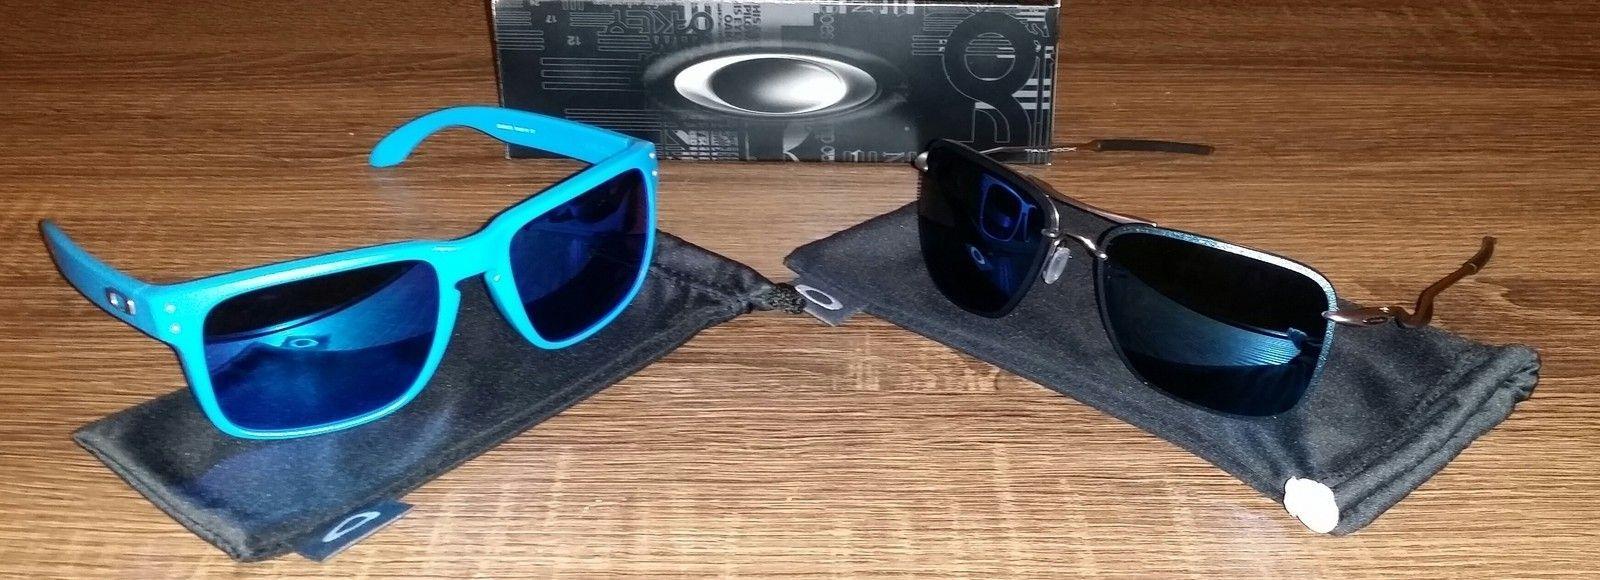 I like blue now... - 4WmE0YC.jpg